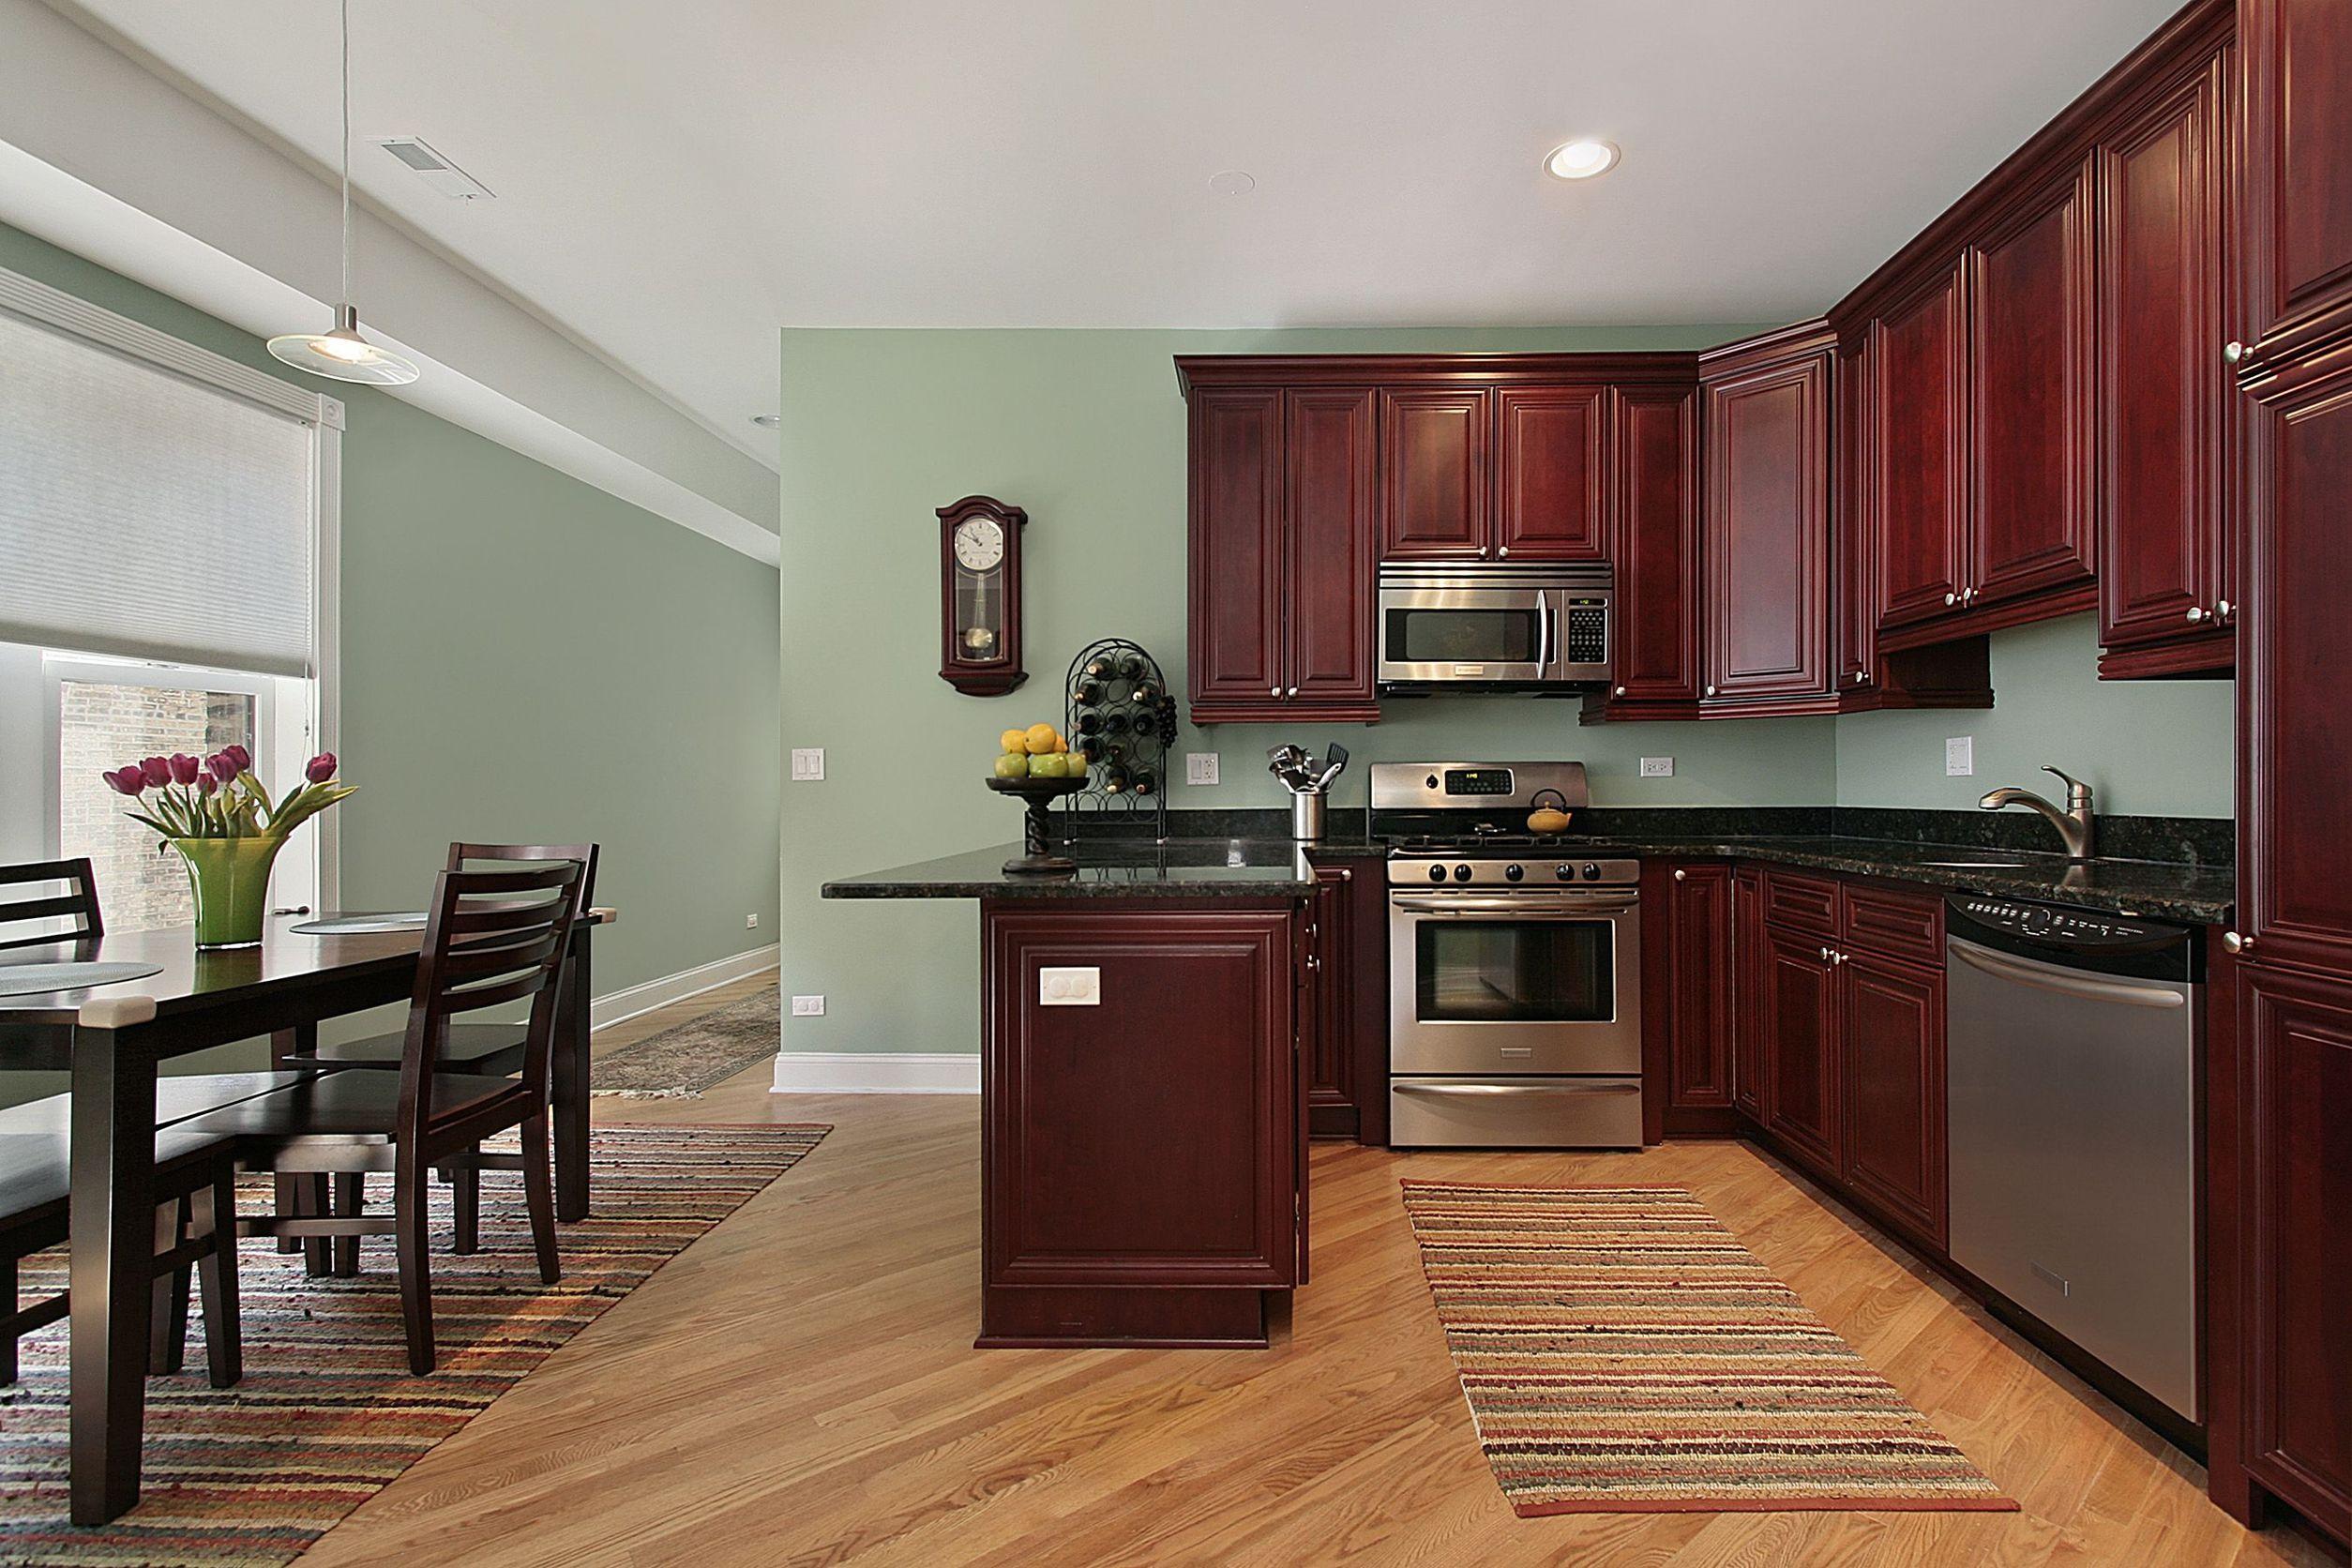 Delightful Cherry Brown Wooden Kitchen Paint